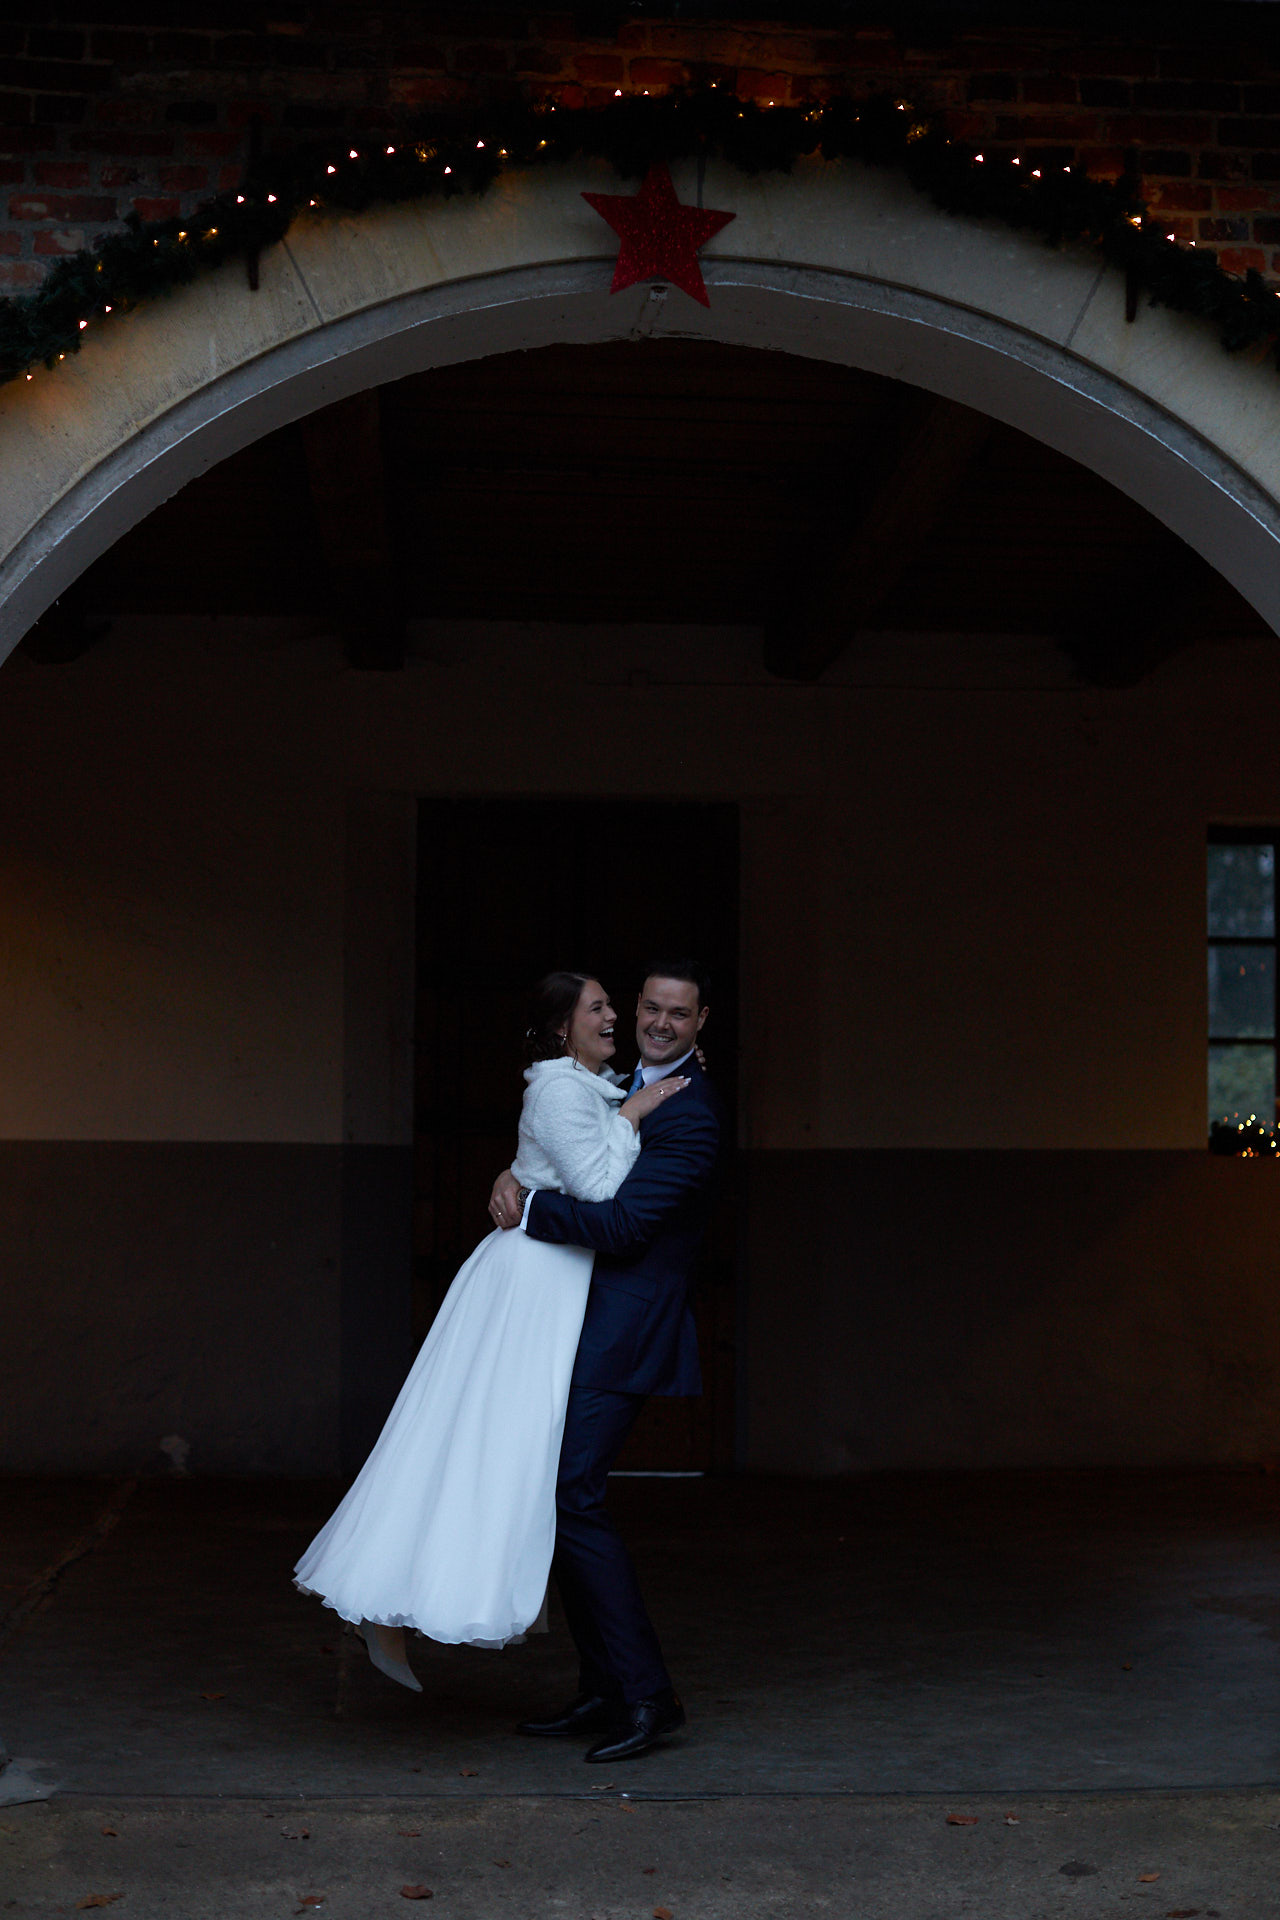 2019-12-20 Laura & Robin - Alena and Daniel Weddings 0479 1